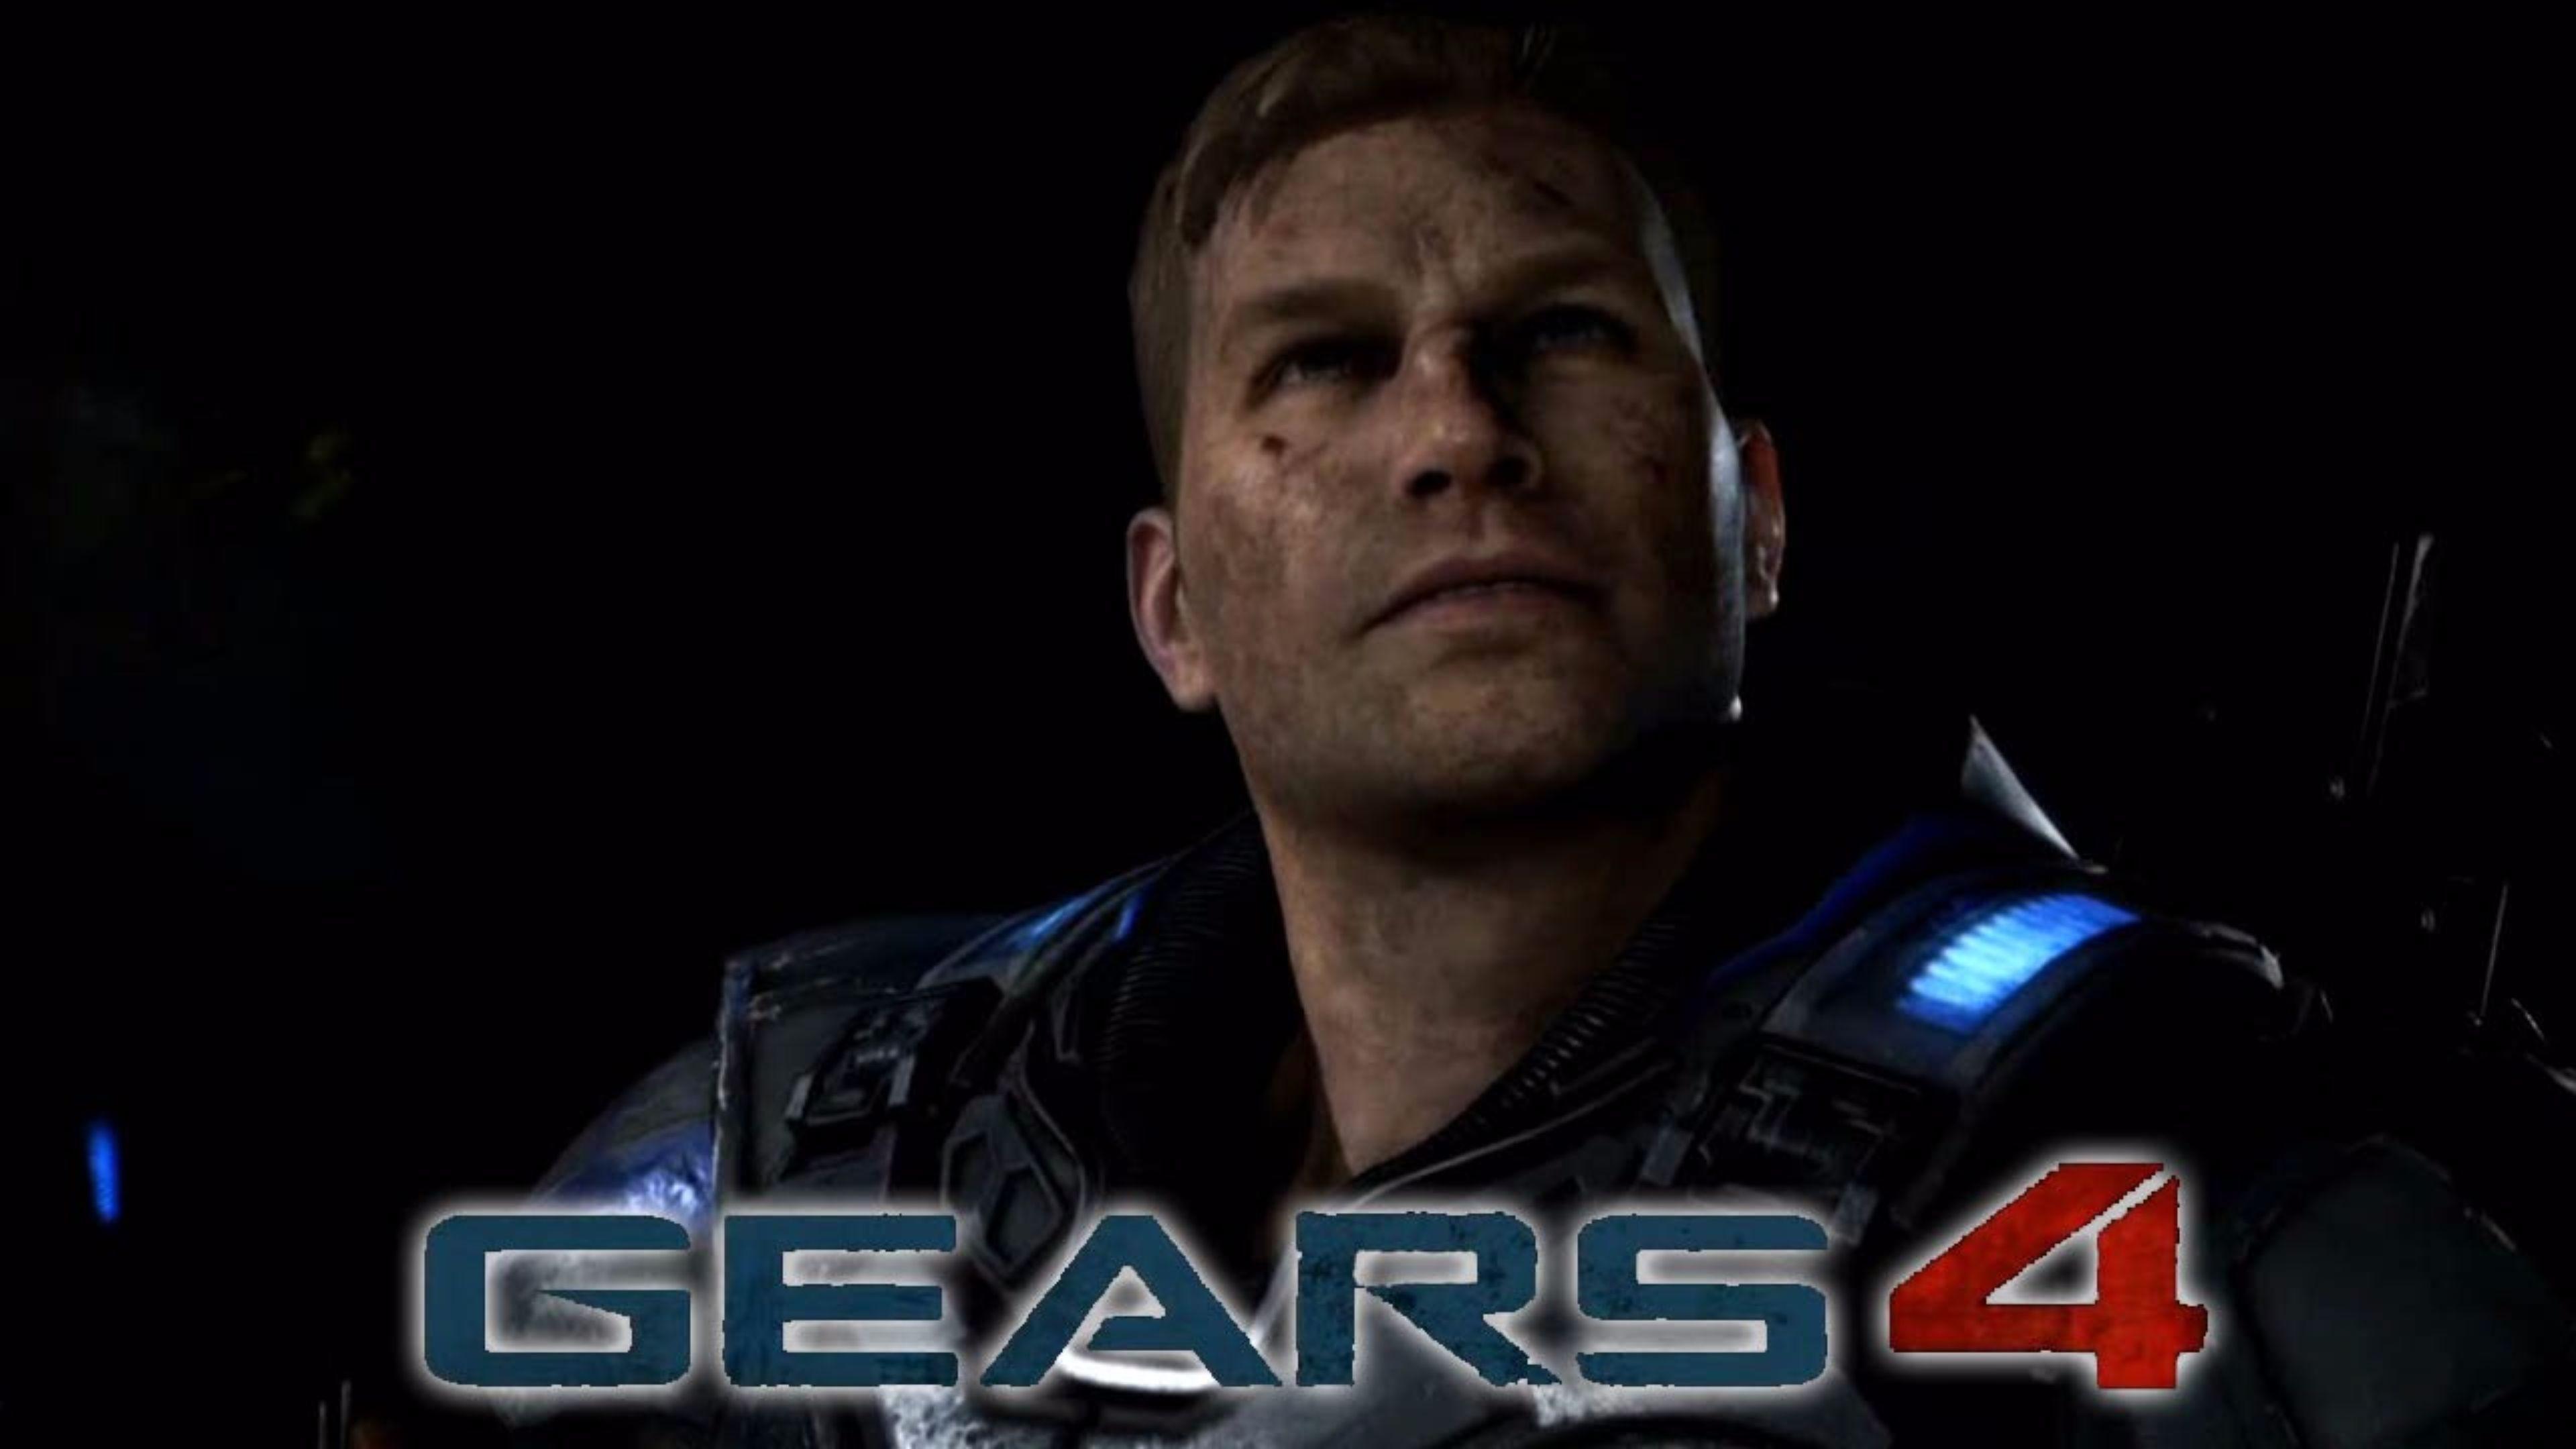 Xbox One Exclusive Gears Of War 4 Wallpaper - HD Wallpaper